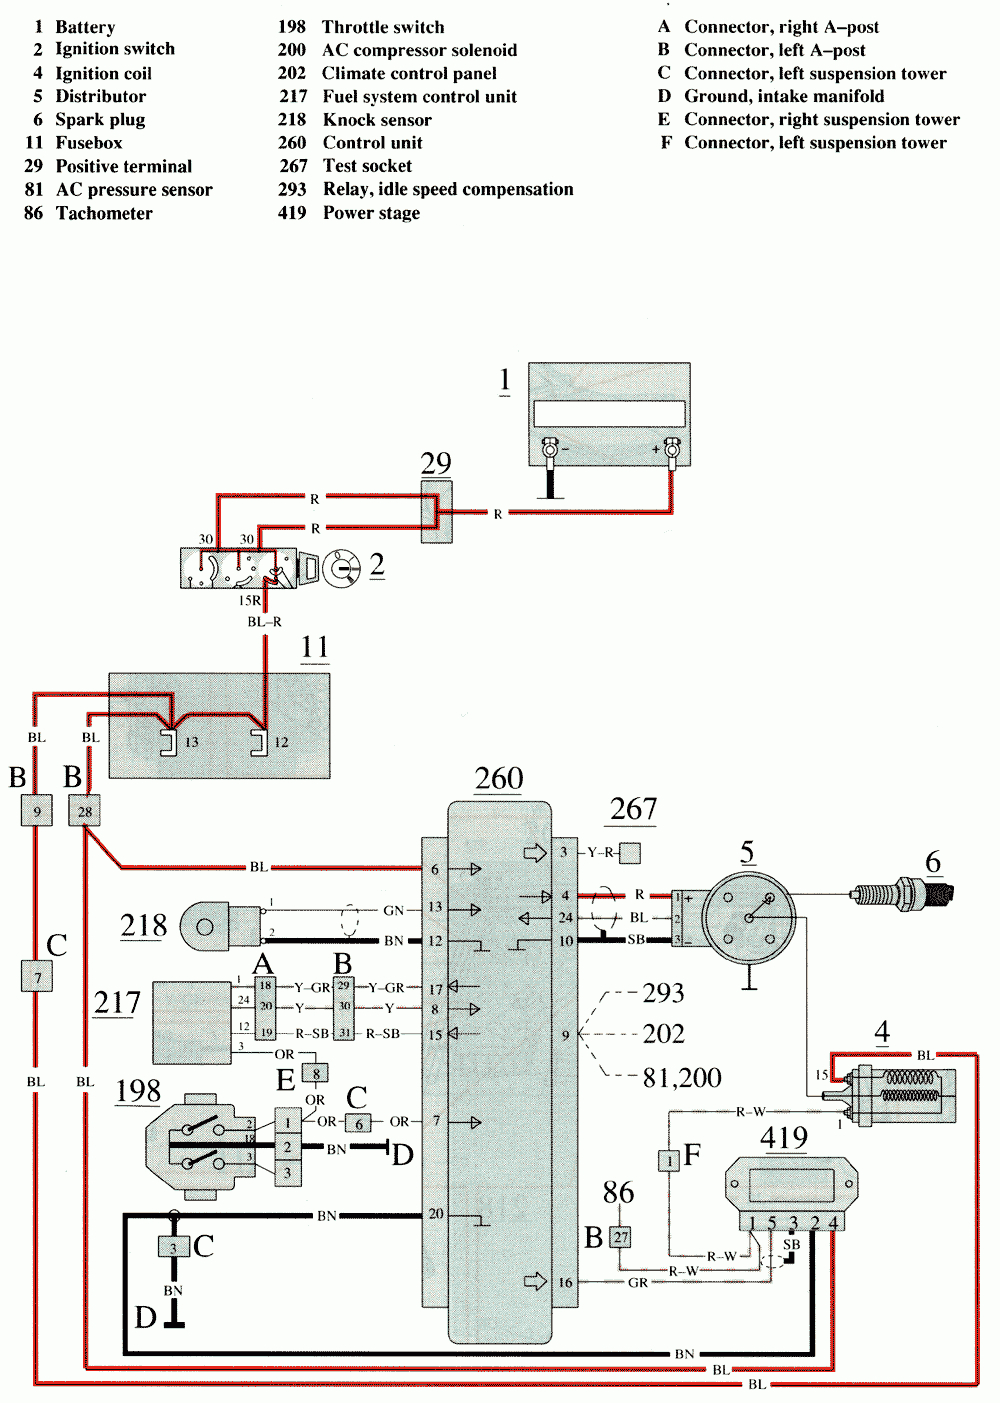 KB_6223] Volvo 740 Ignition Switch Wiring Diagram Schematic WiringTrofu Pead Phae Mohammedshrine Librar Wiring 101